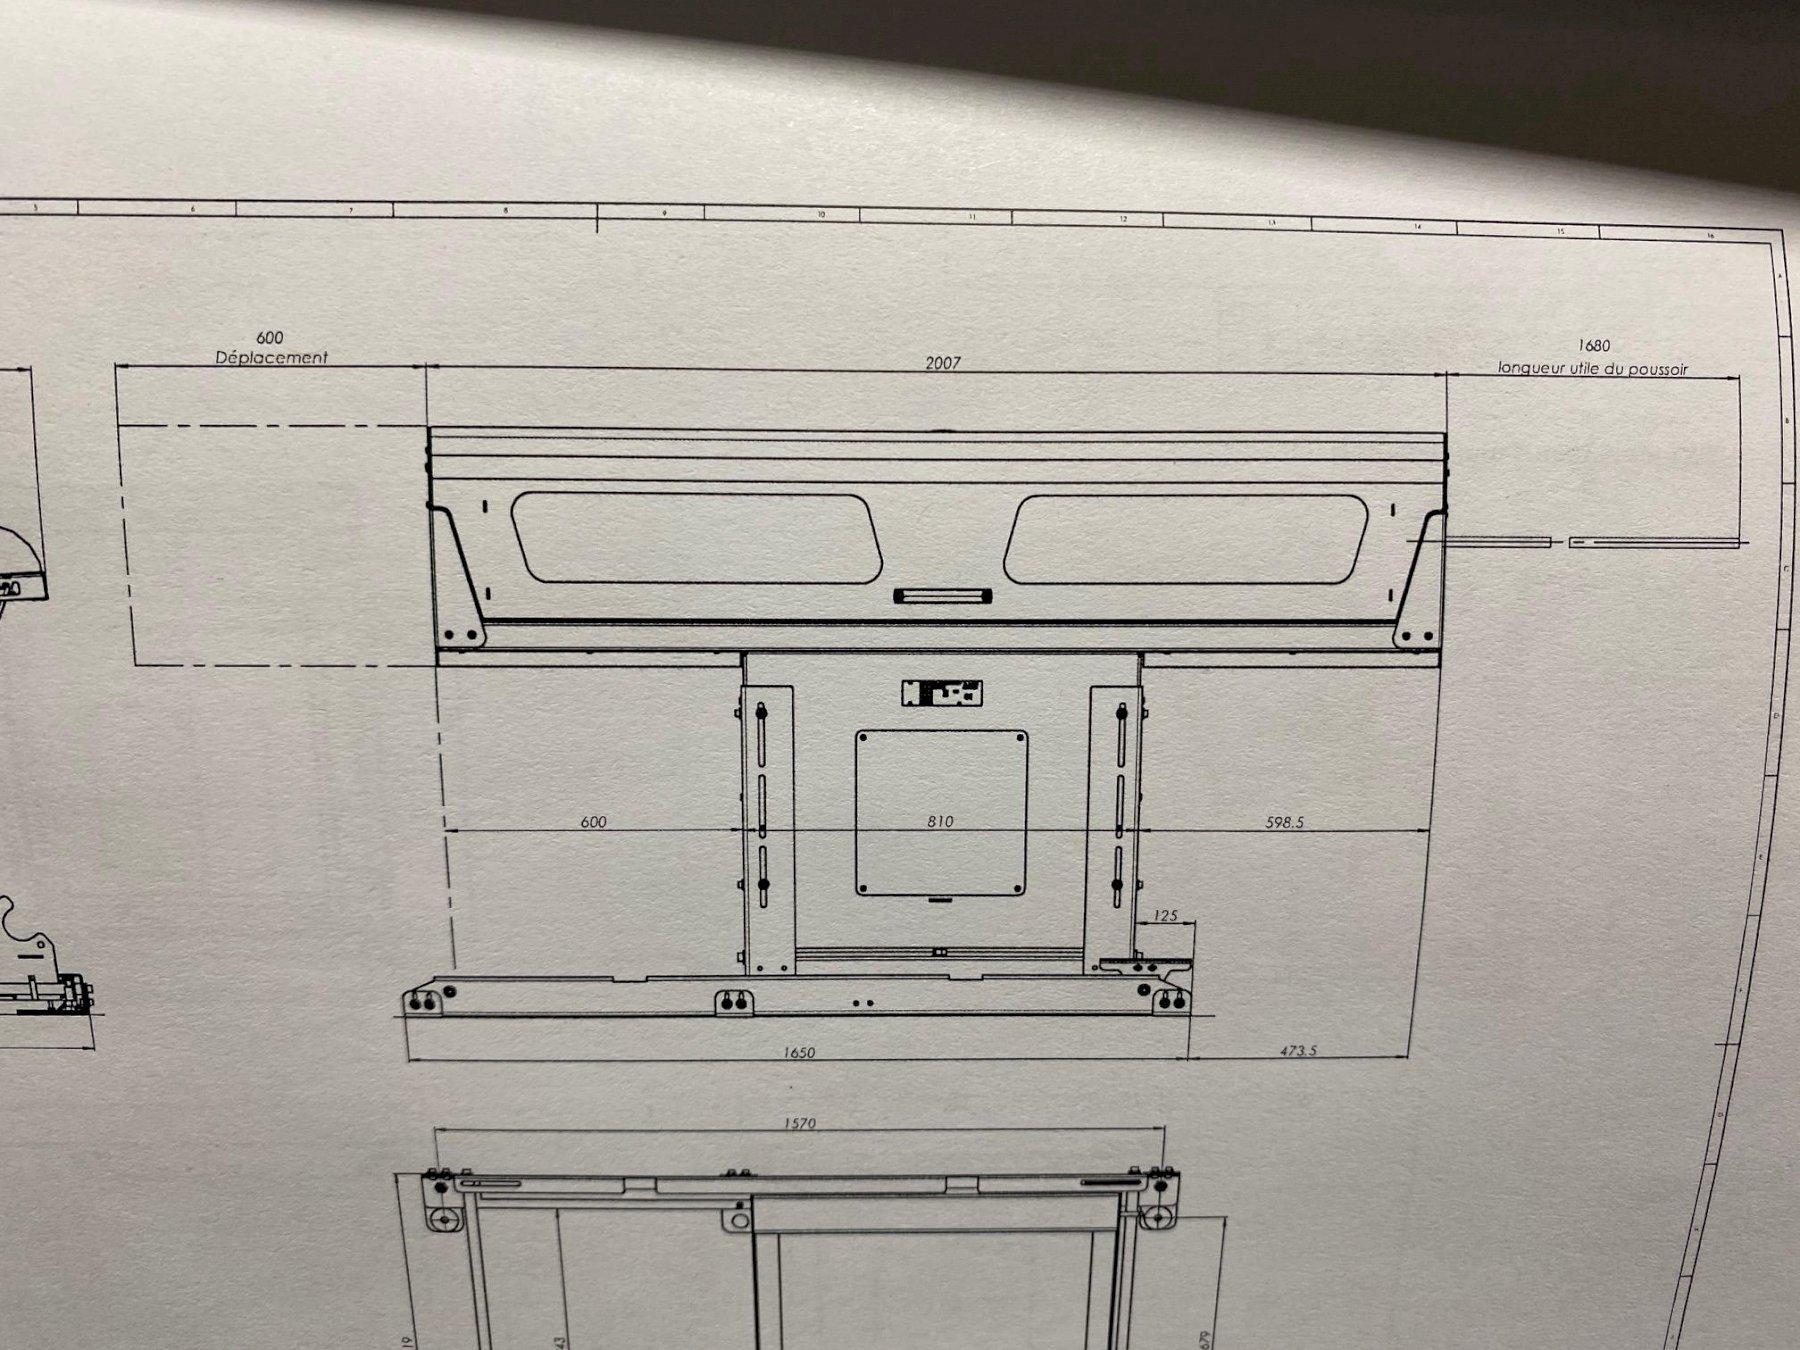 LNS Quick Load Servo 80 S2 Bar Feeder 2014